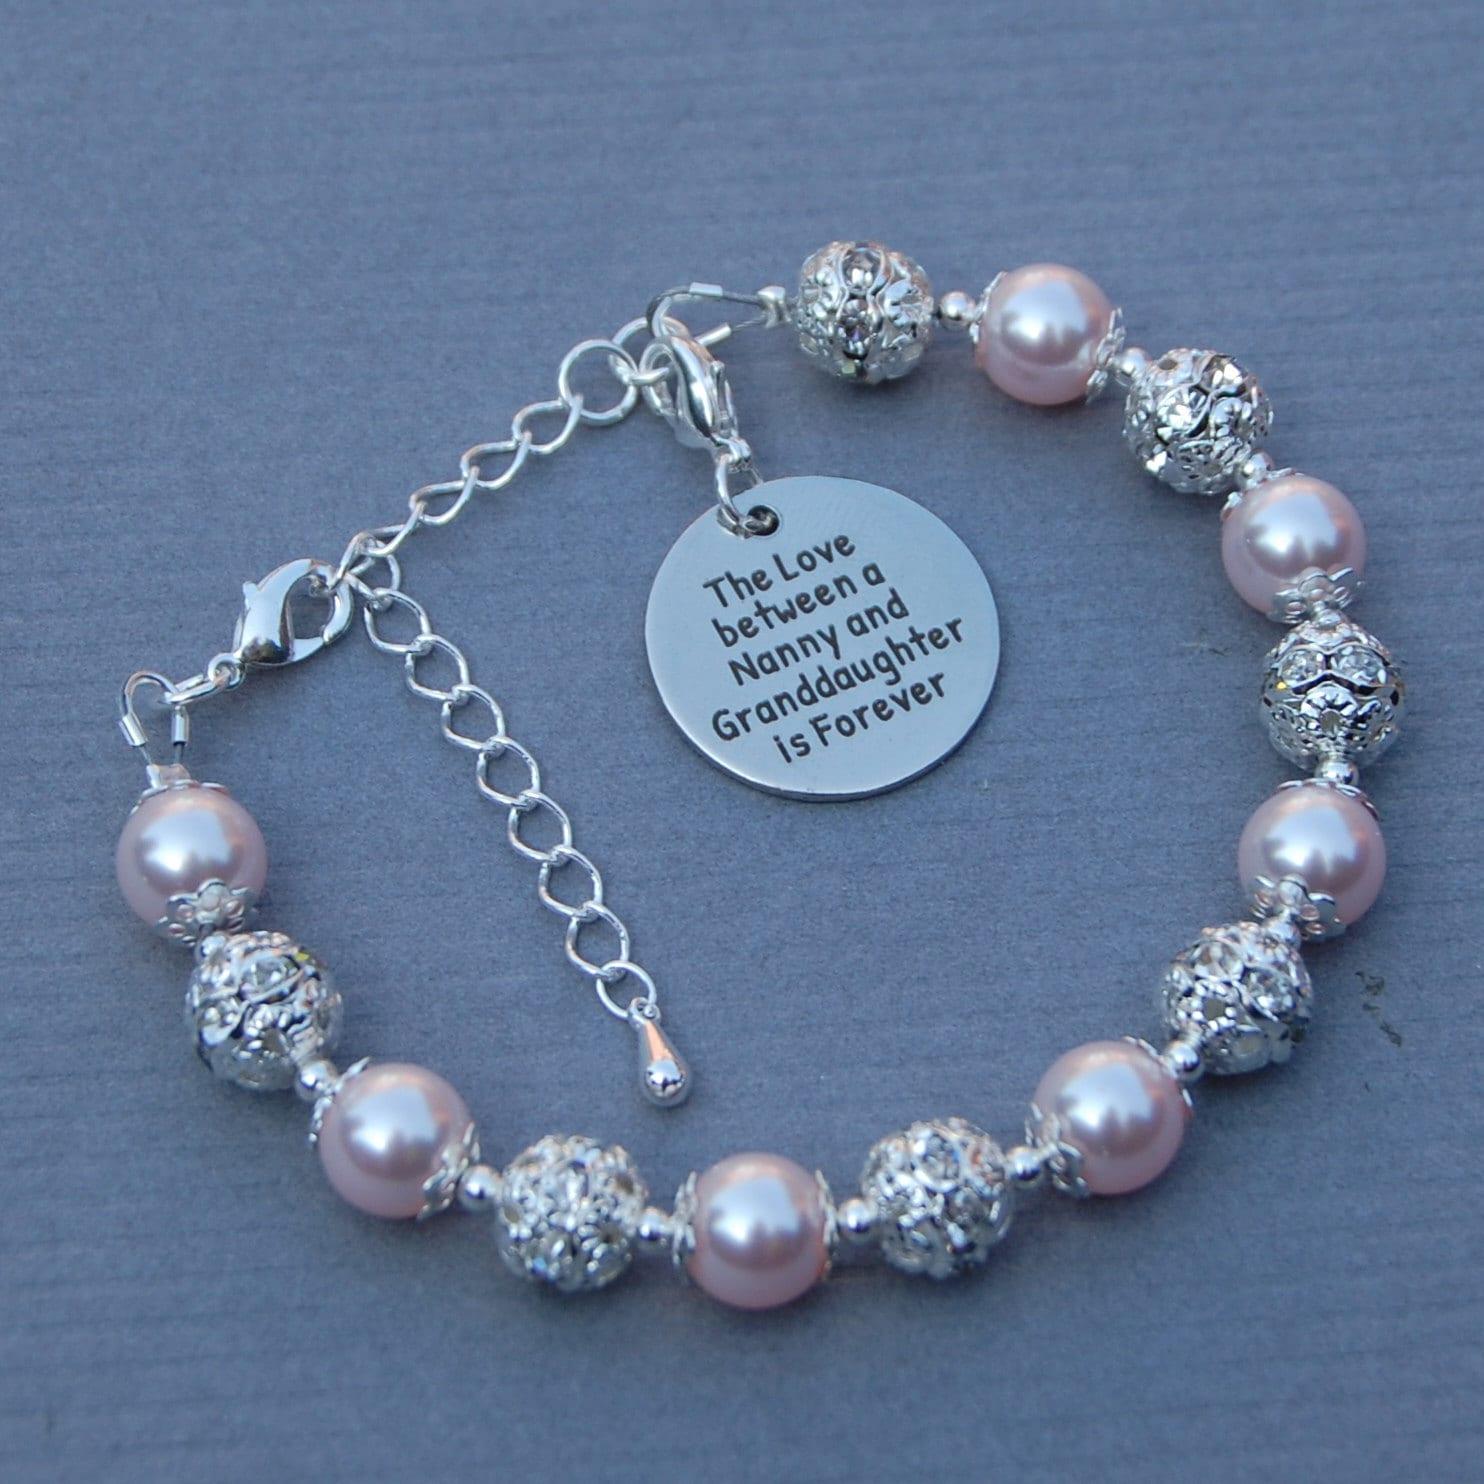 Nanny Birthday Charm Bracelet with Gift Box Womens Jewellery 6g5M1